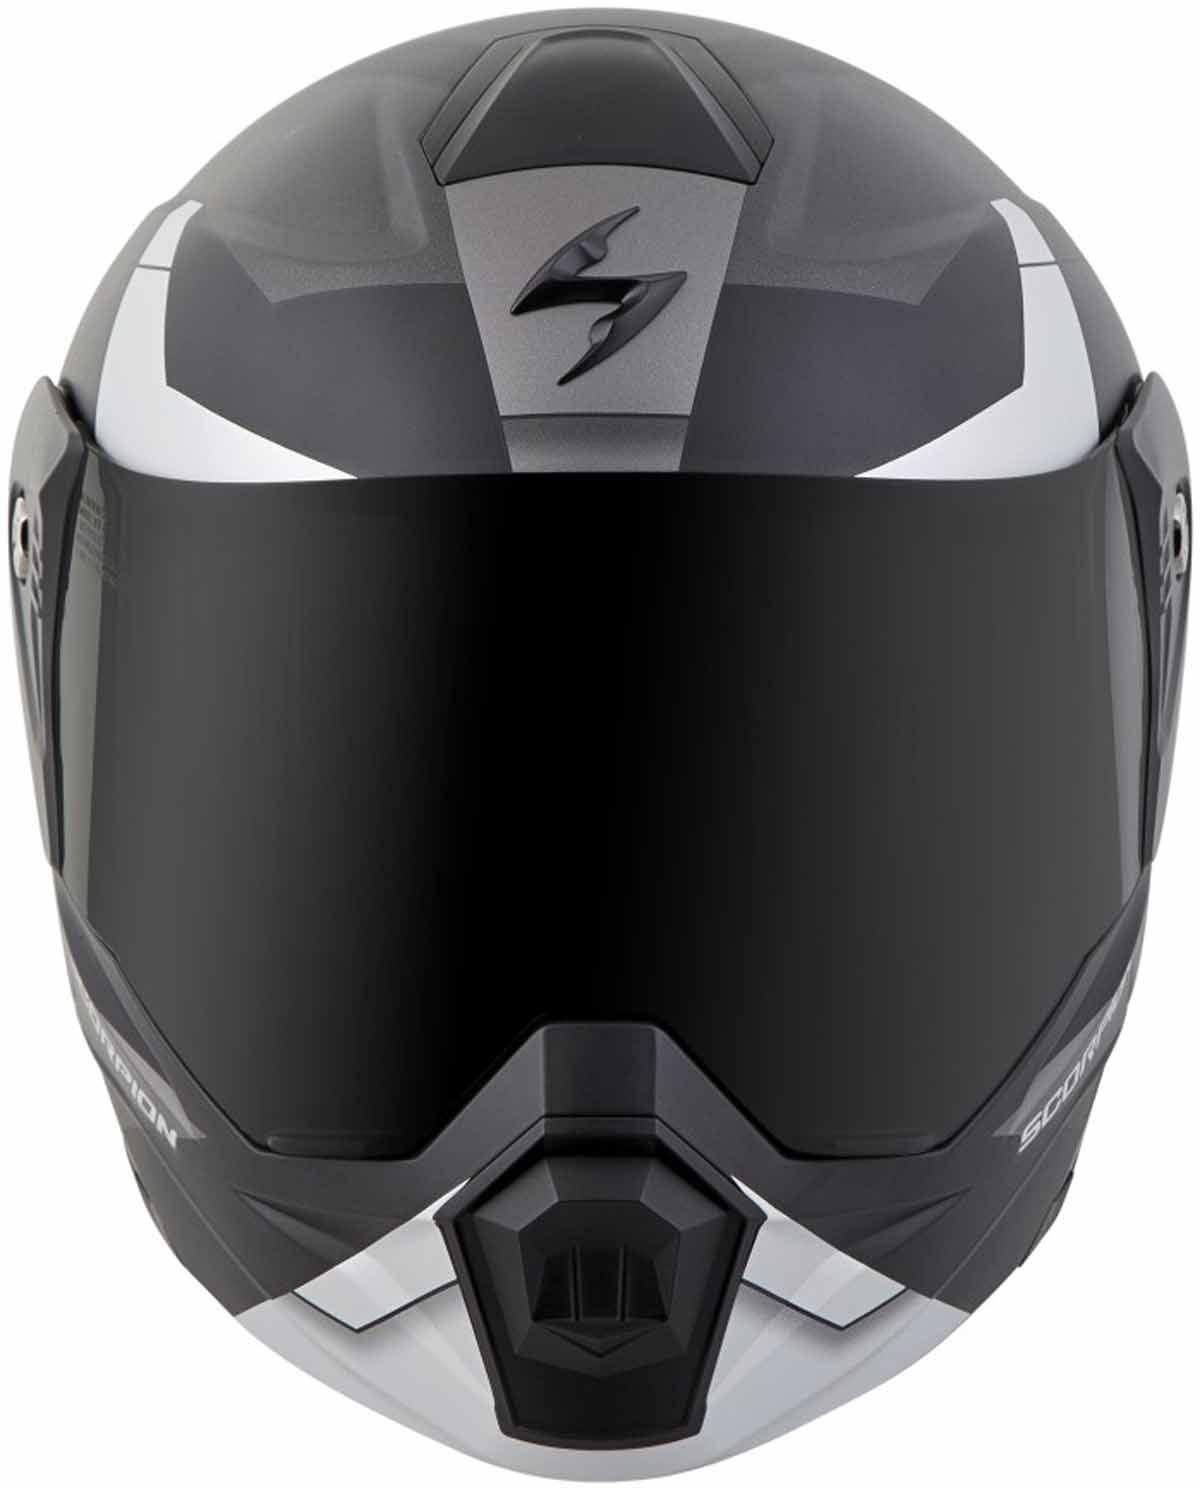 Scorpion-EXO-AT950-Helmet-Flip-Up-Modular-Dual-Sport-Adventure-ADV-DOT-XS-3XL miniature 31